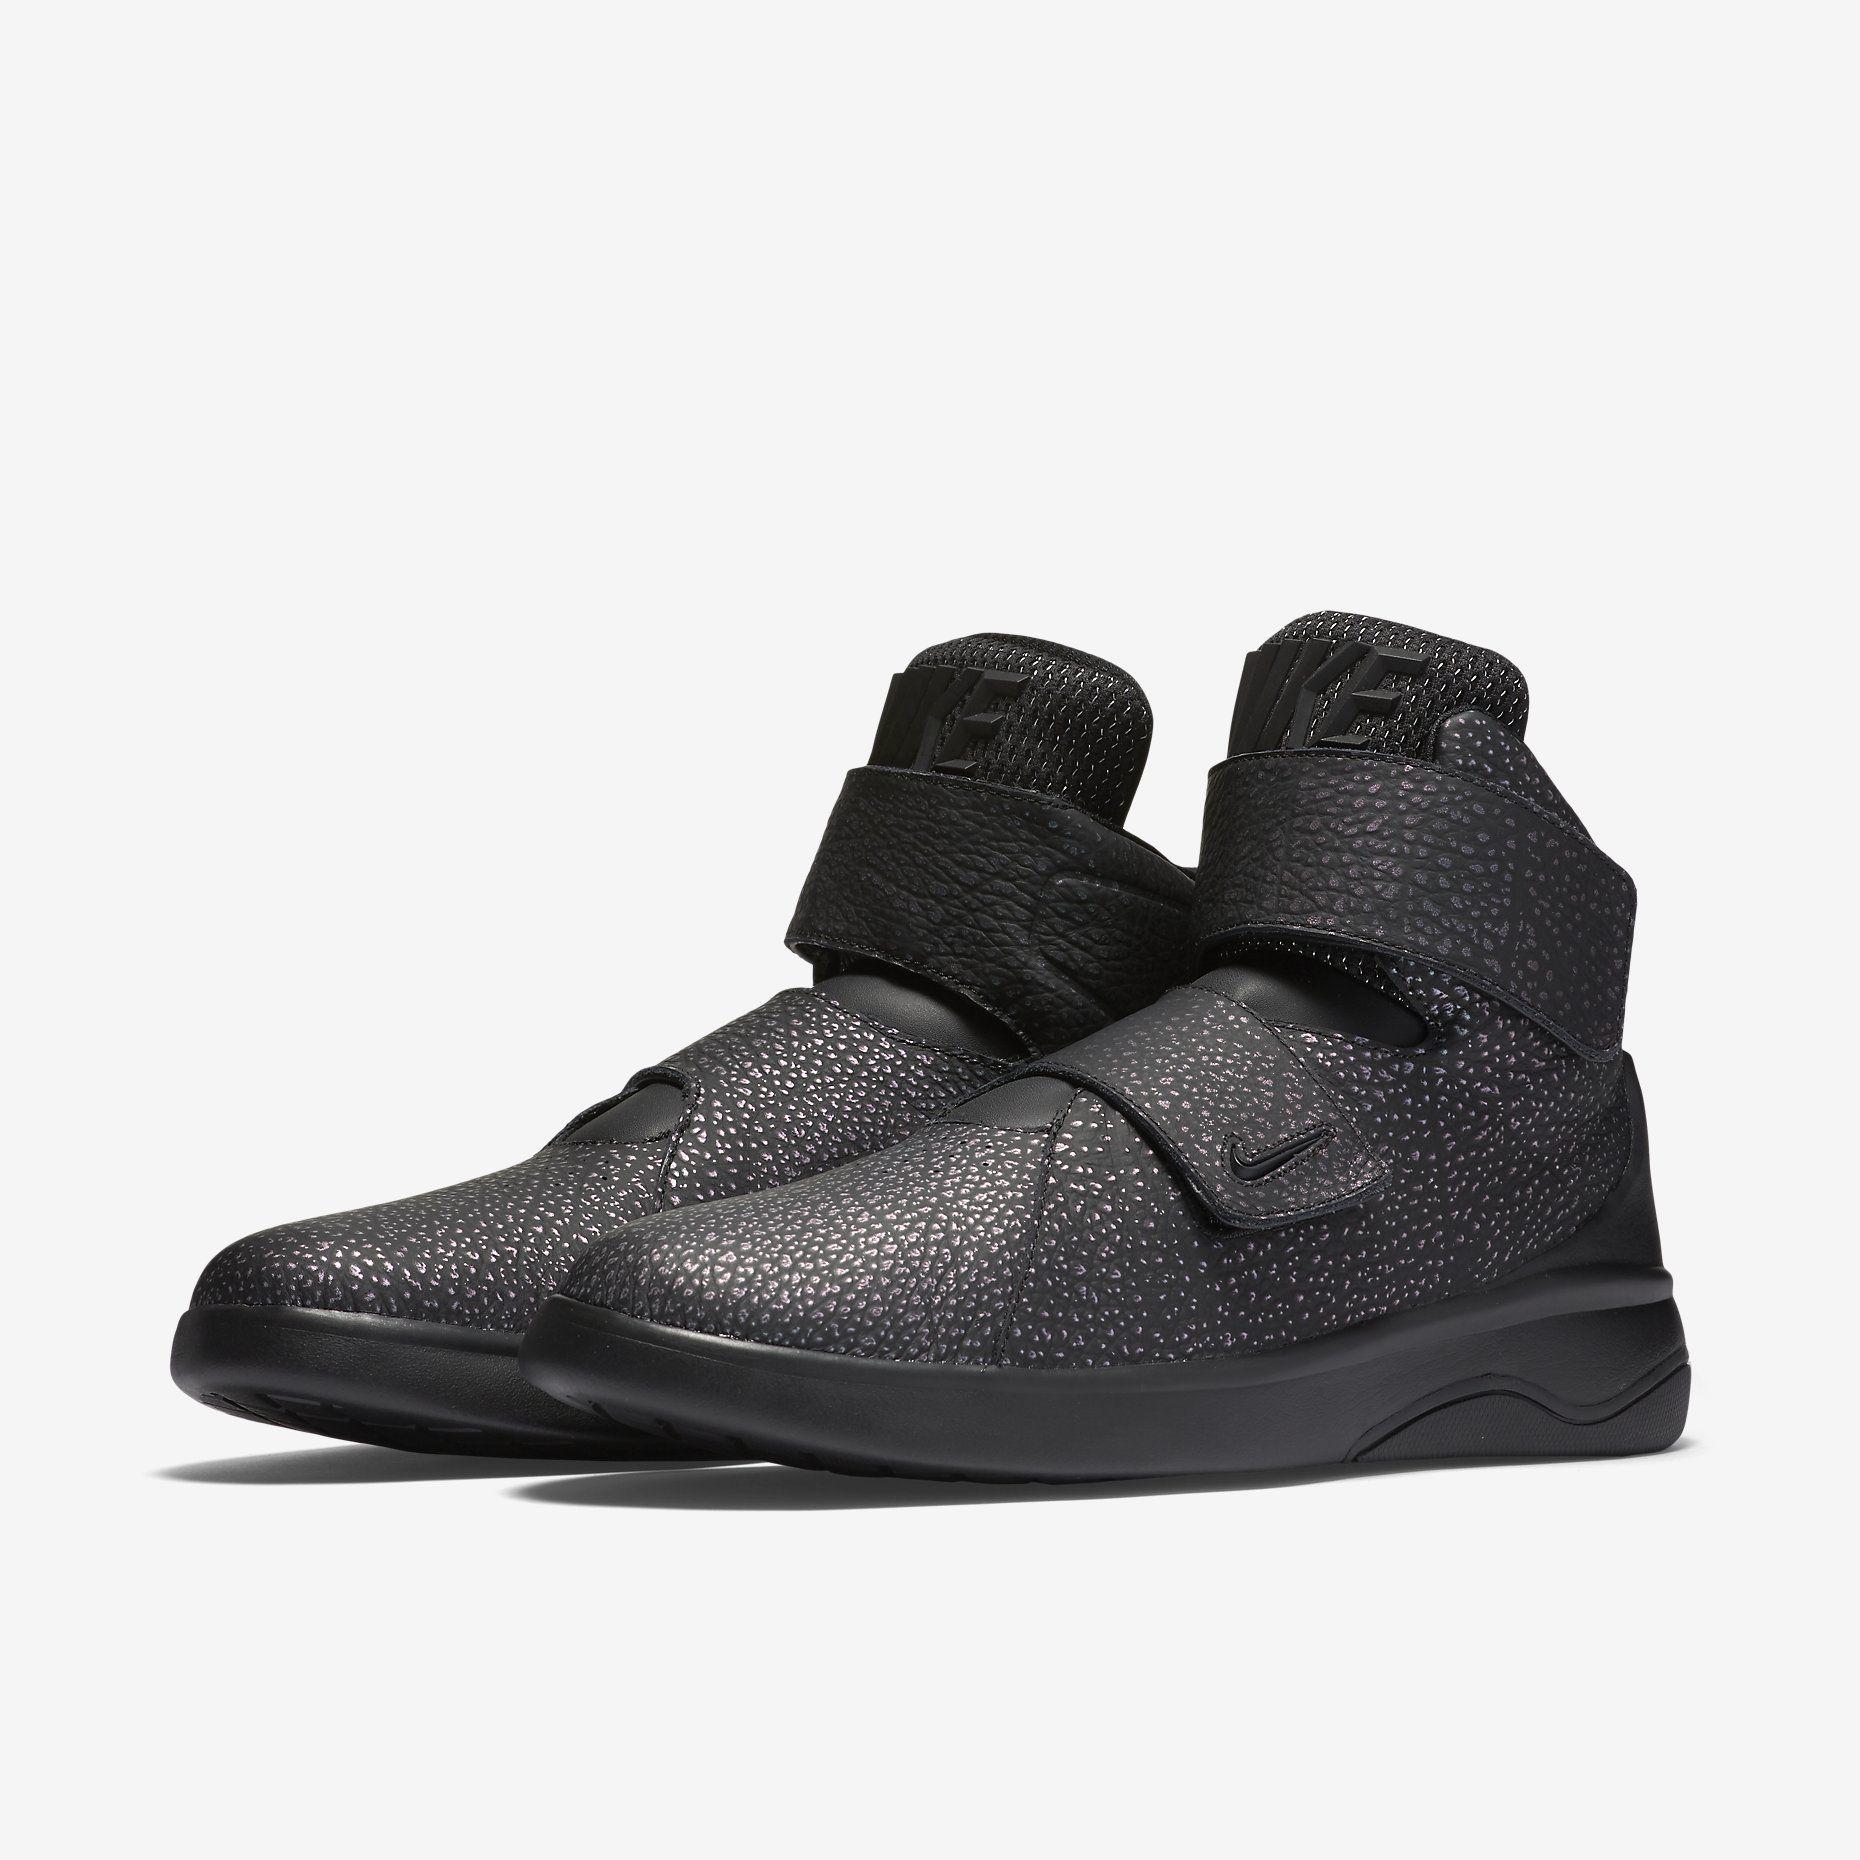 factory authentic e6419 f9c8a Nike Marxman premium QS Sneaker Release, New Trainers, Fashion Shoes, Mens  Fashion,